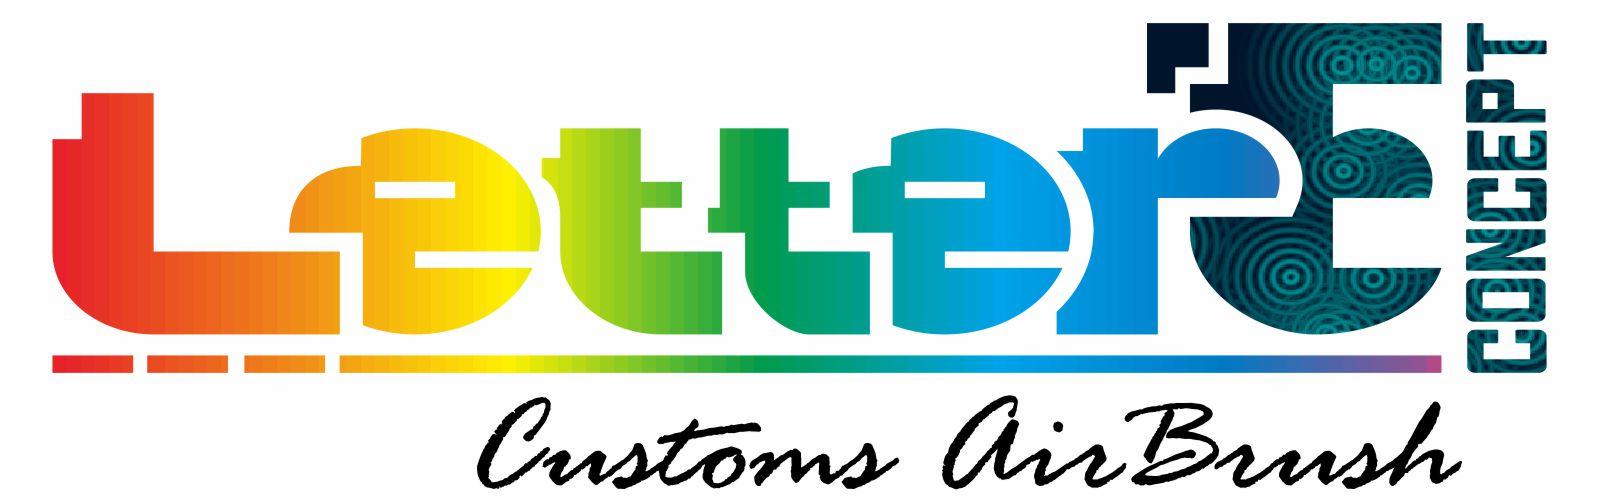 Letter E Custom Airbrush Cirebon